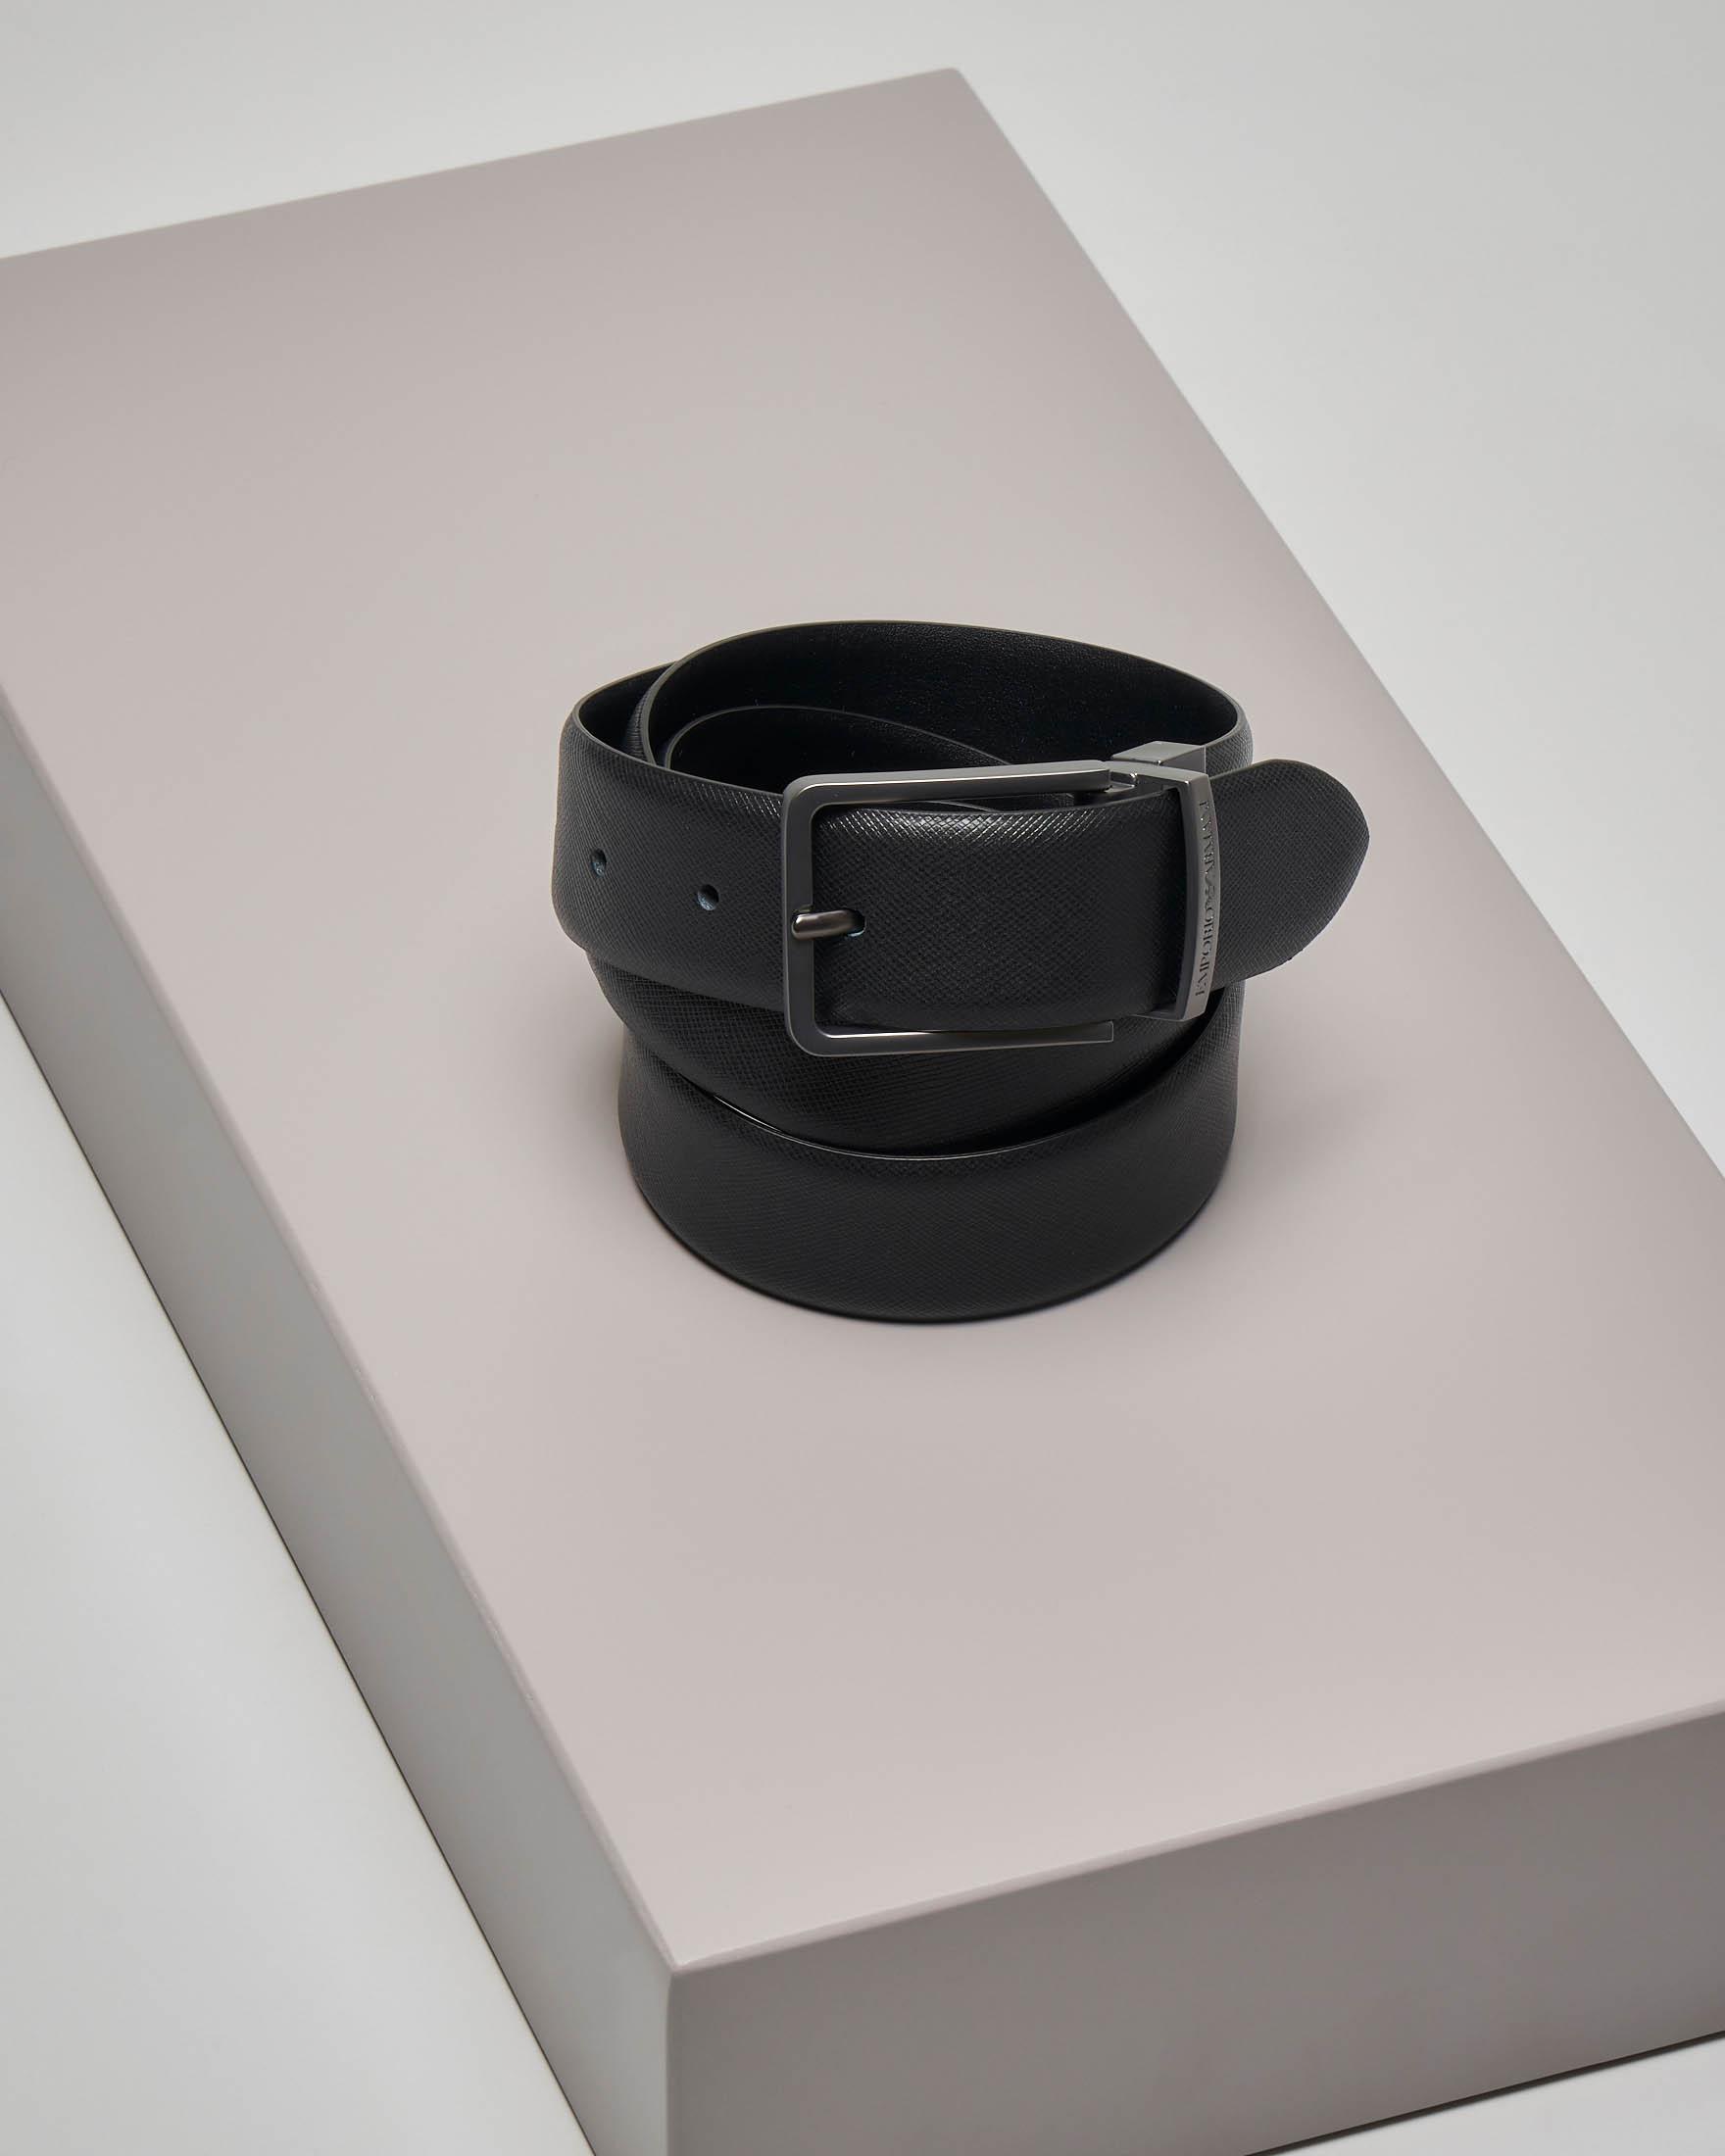 Cintura nera in pelle saffiano reversibile in pelle liscia